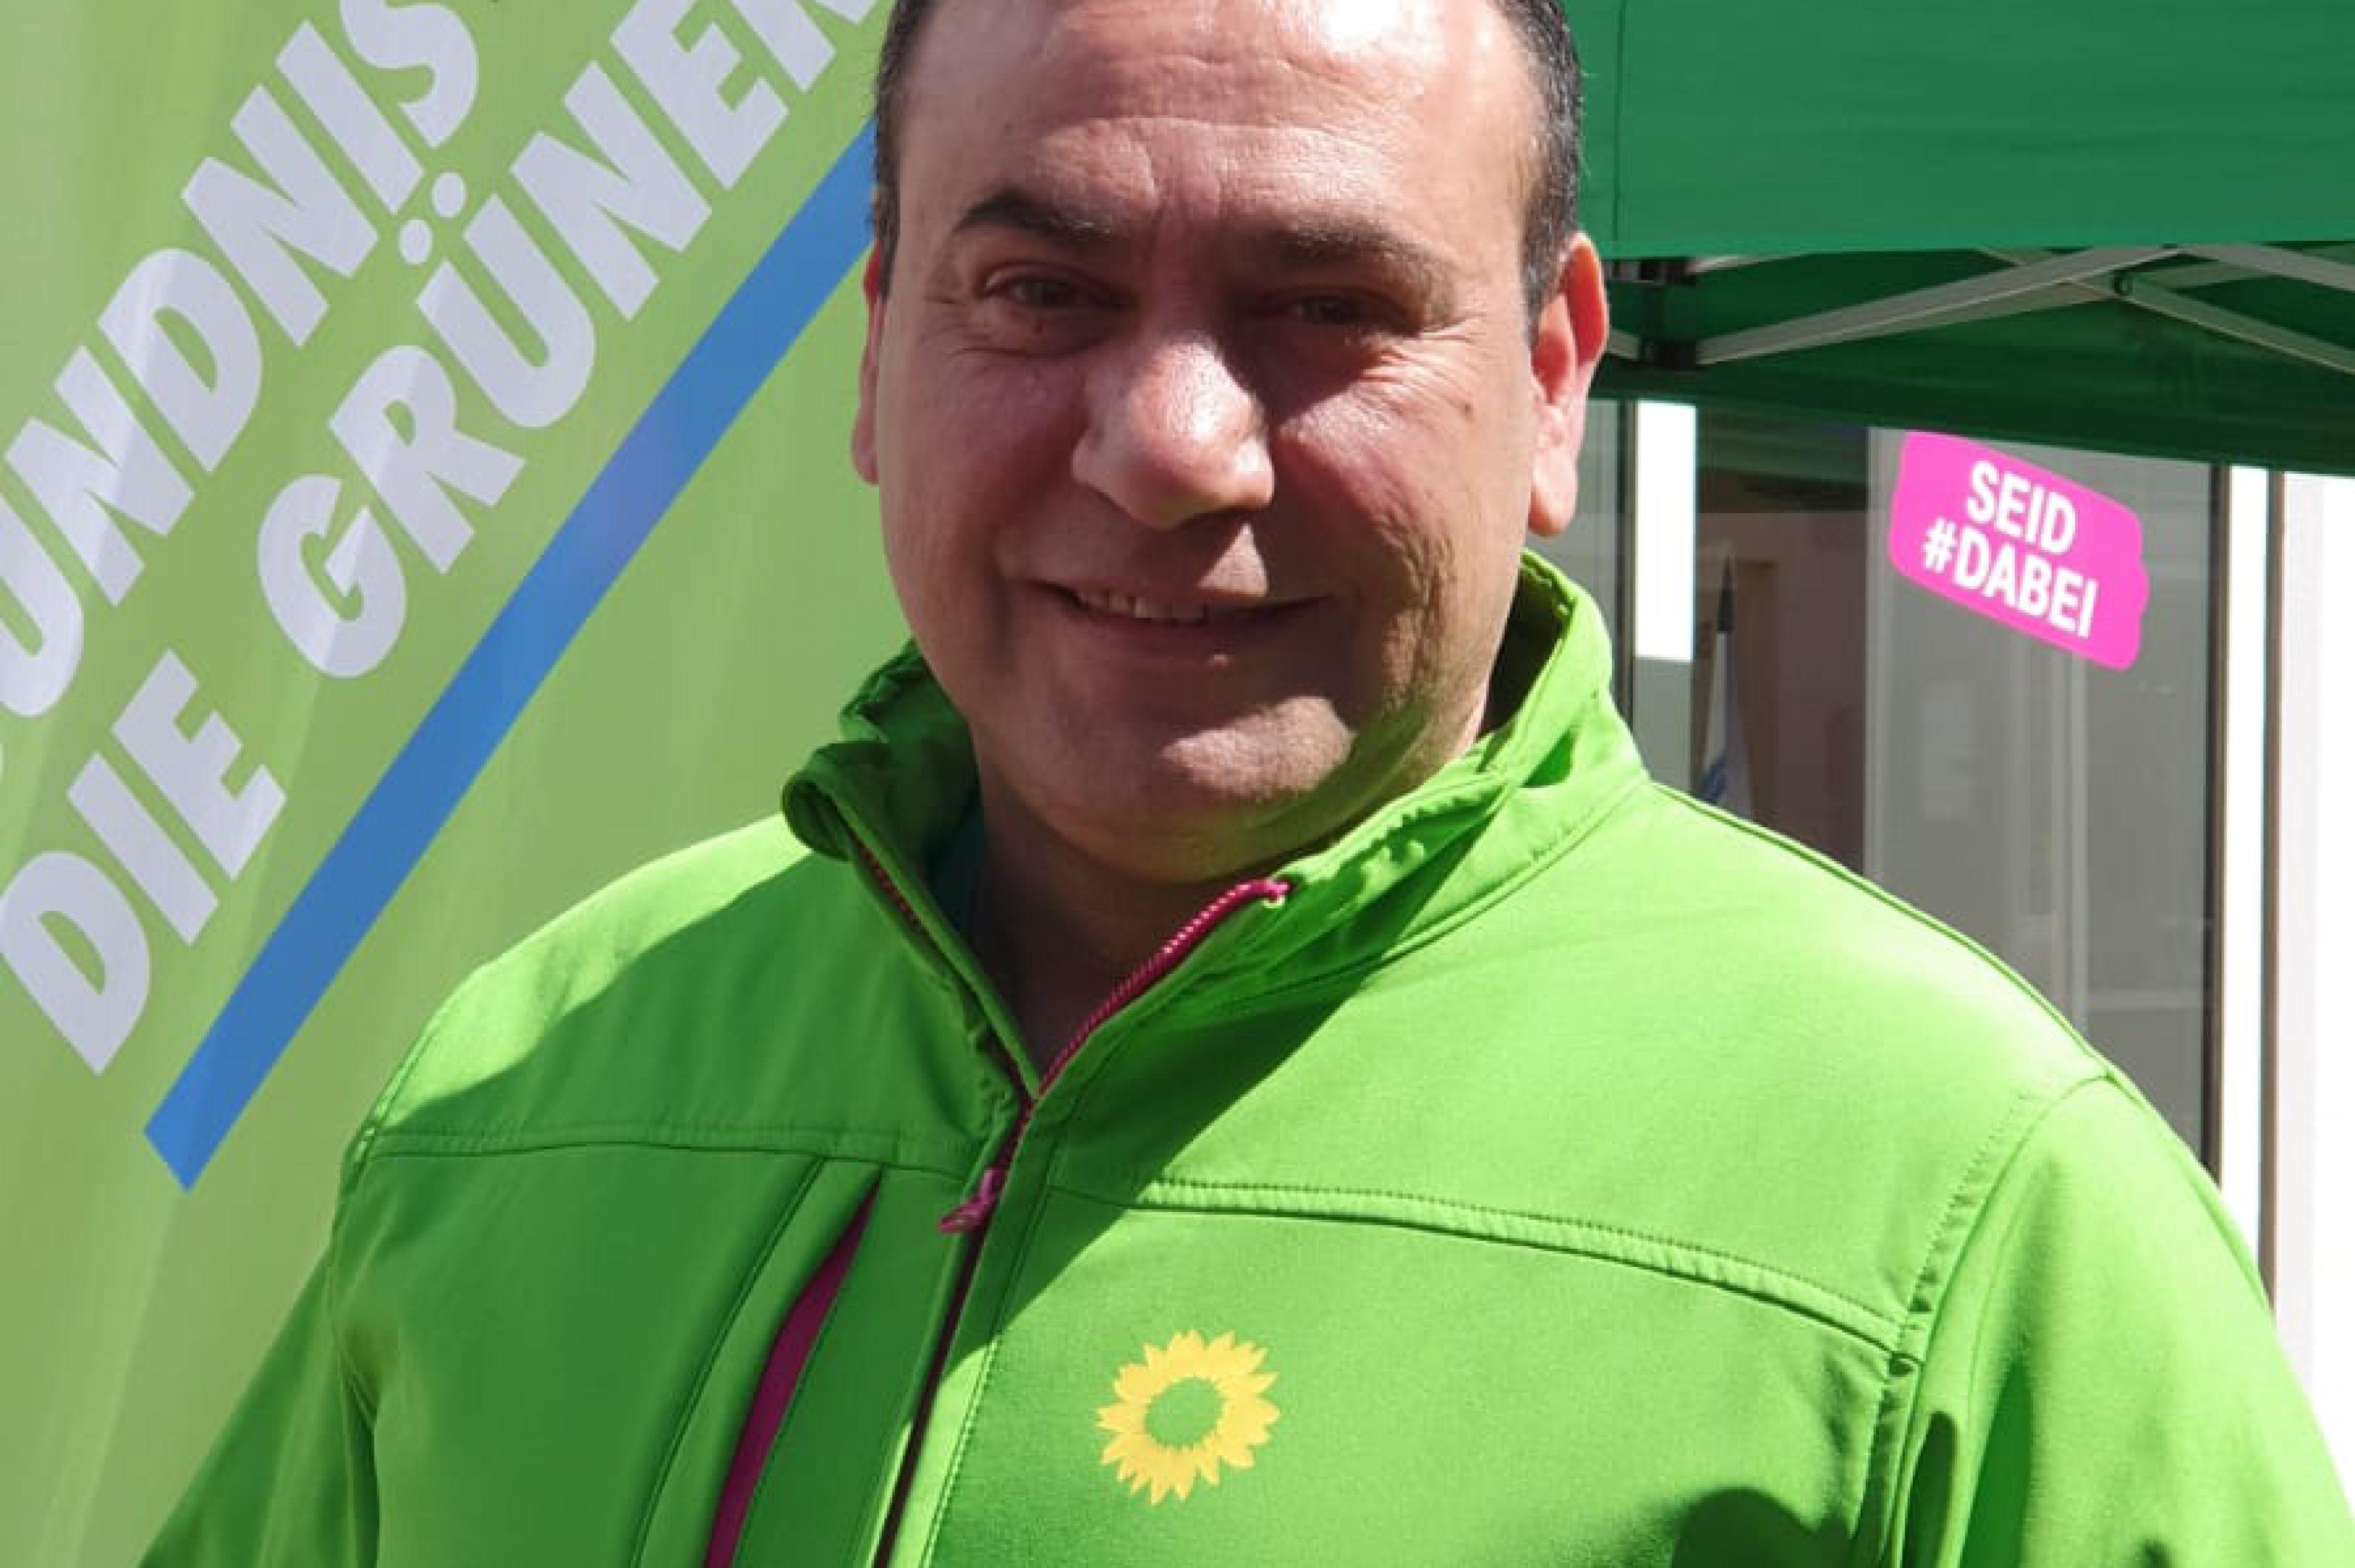 Zum Europa-Erfolg der Grünen